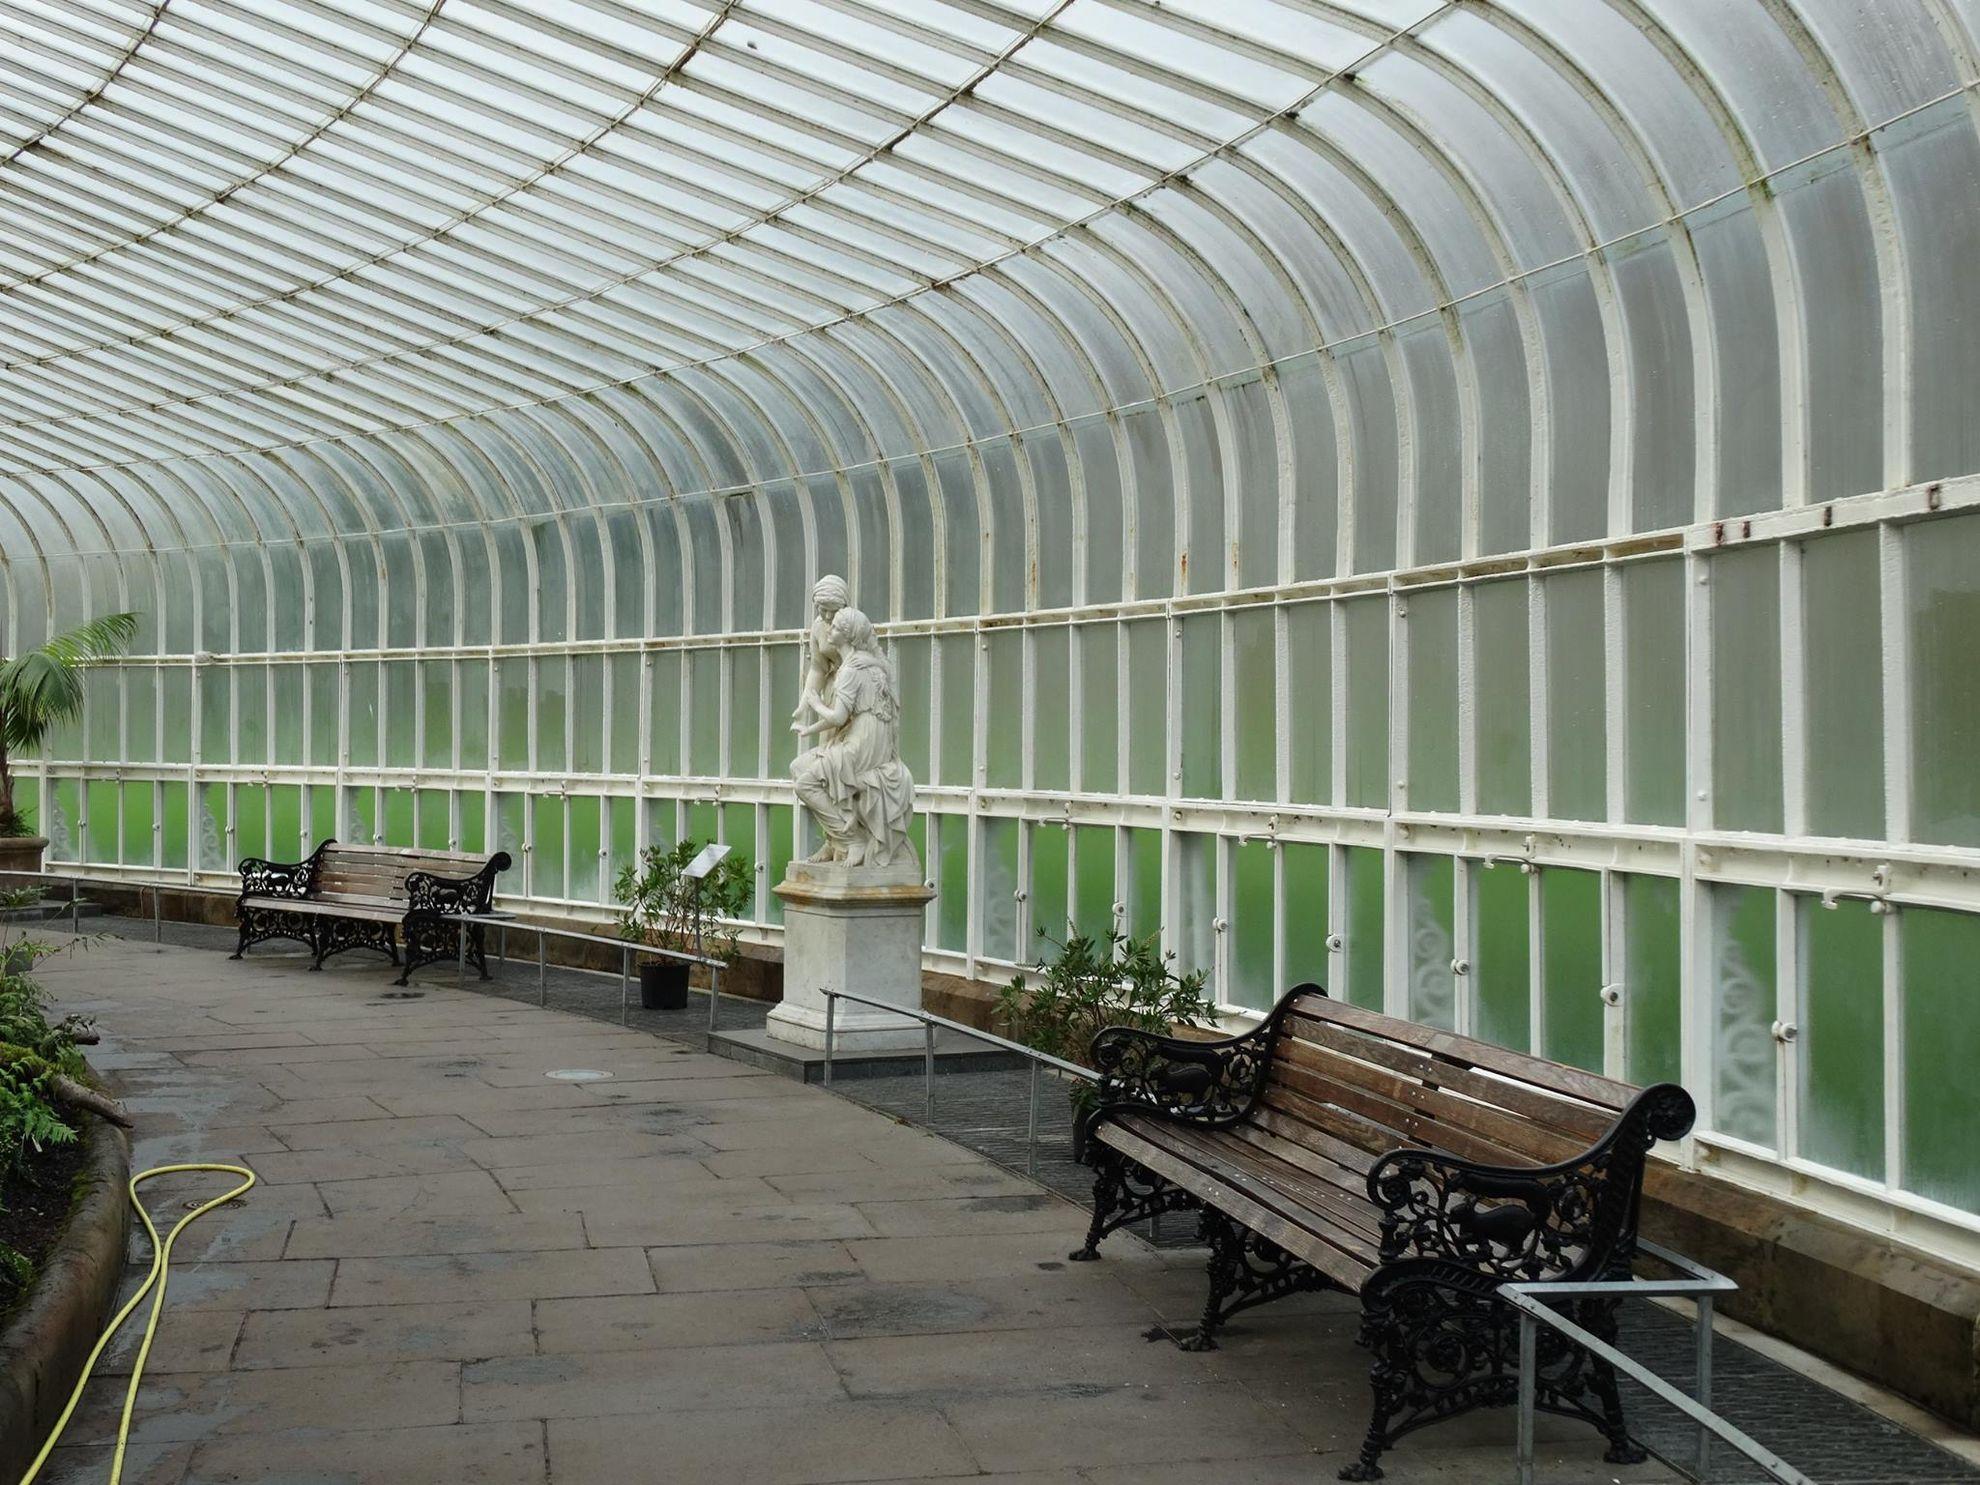 giardini botanici glasgow, serra